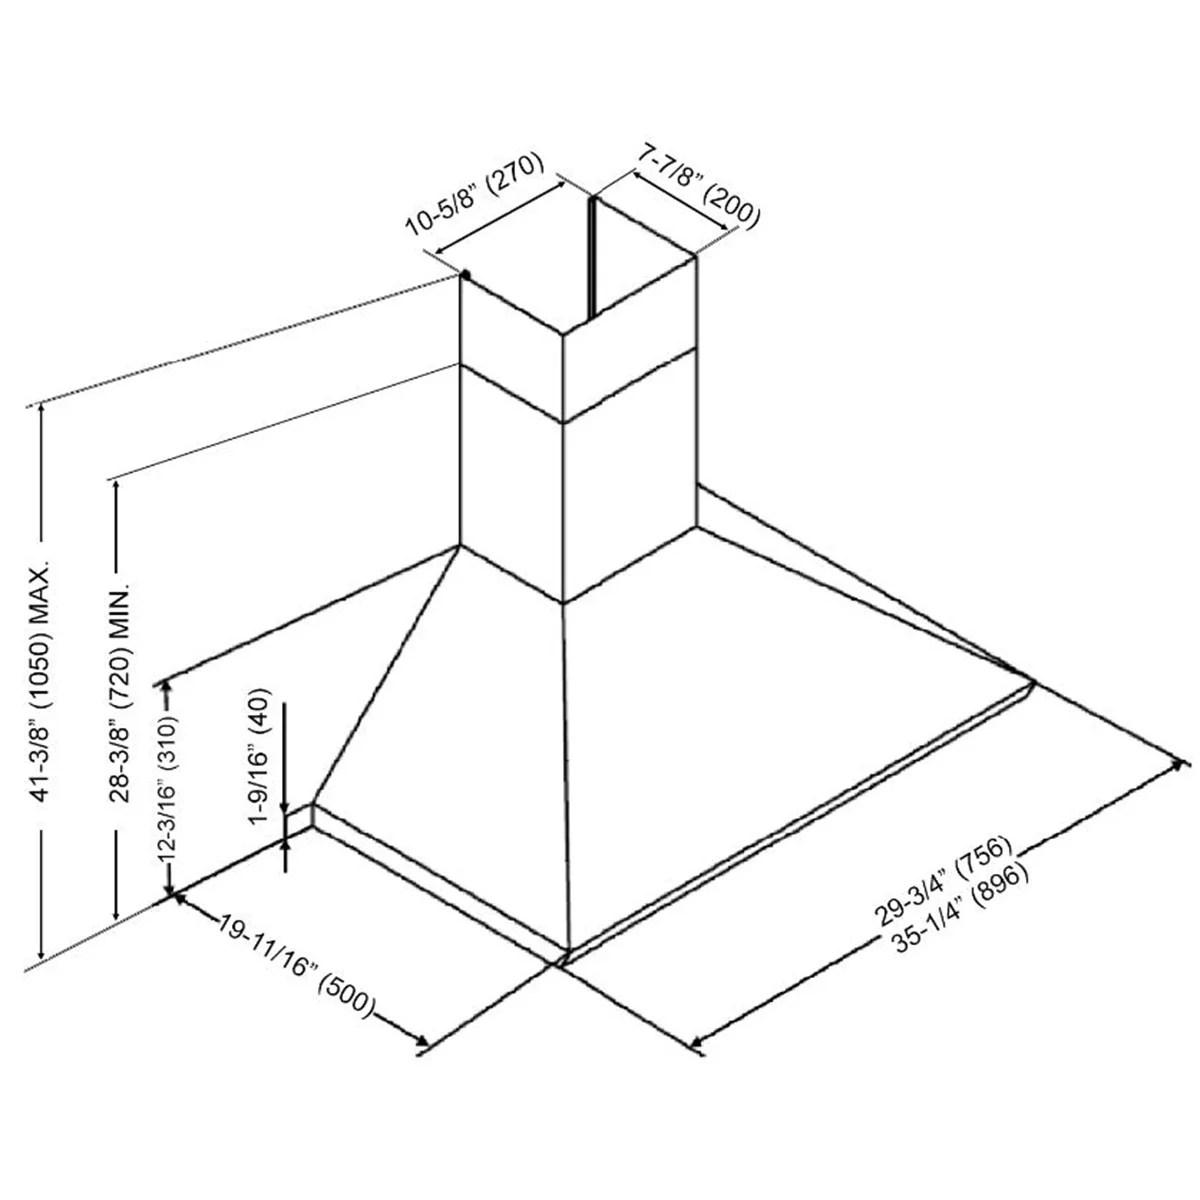 Wiring Diagram Rsds Sbus,Diagram • Mifinder.co